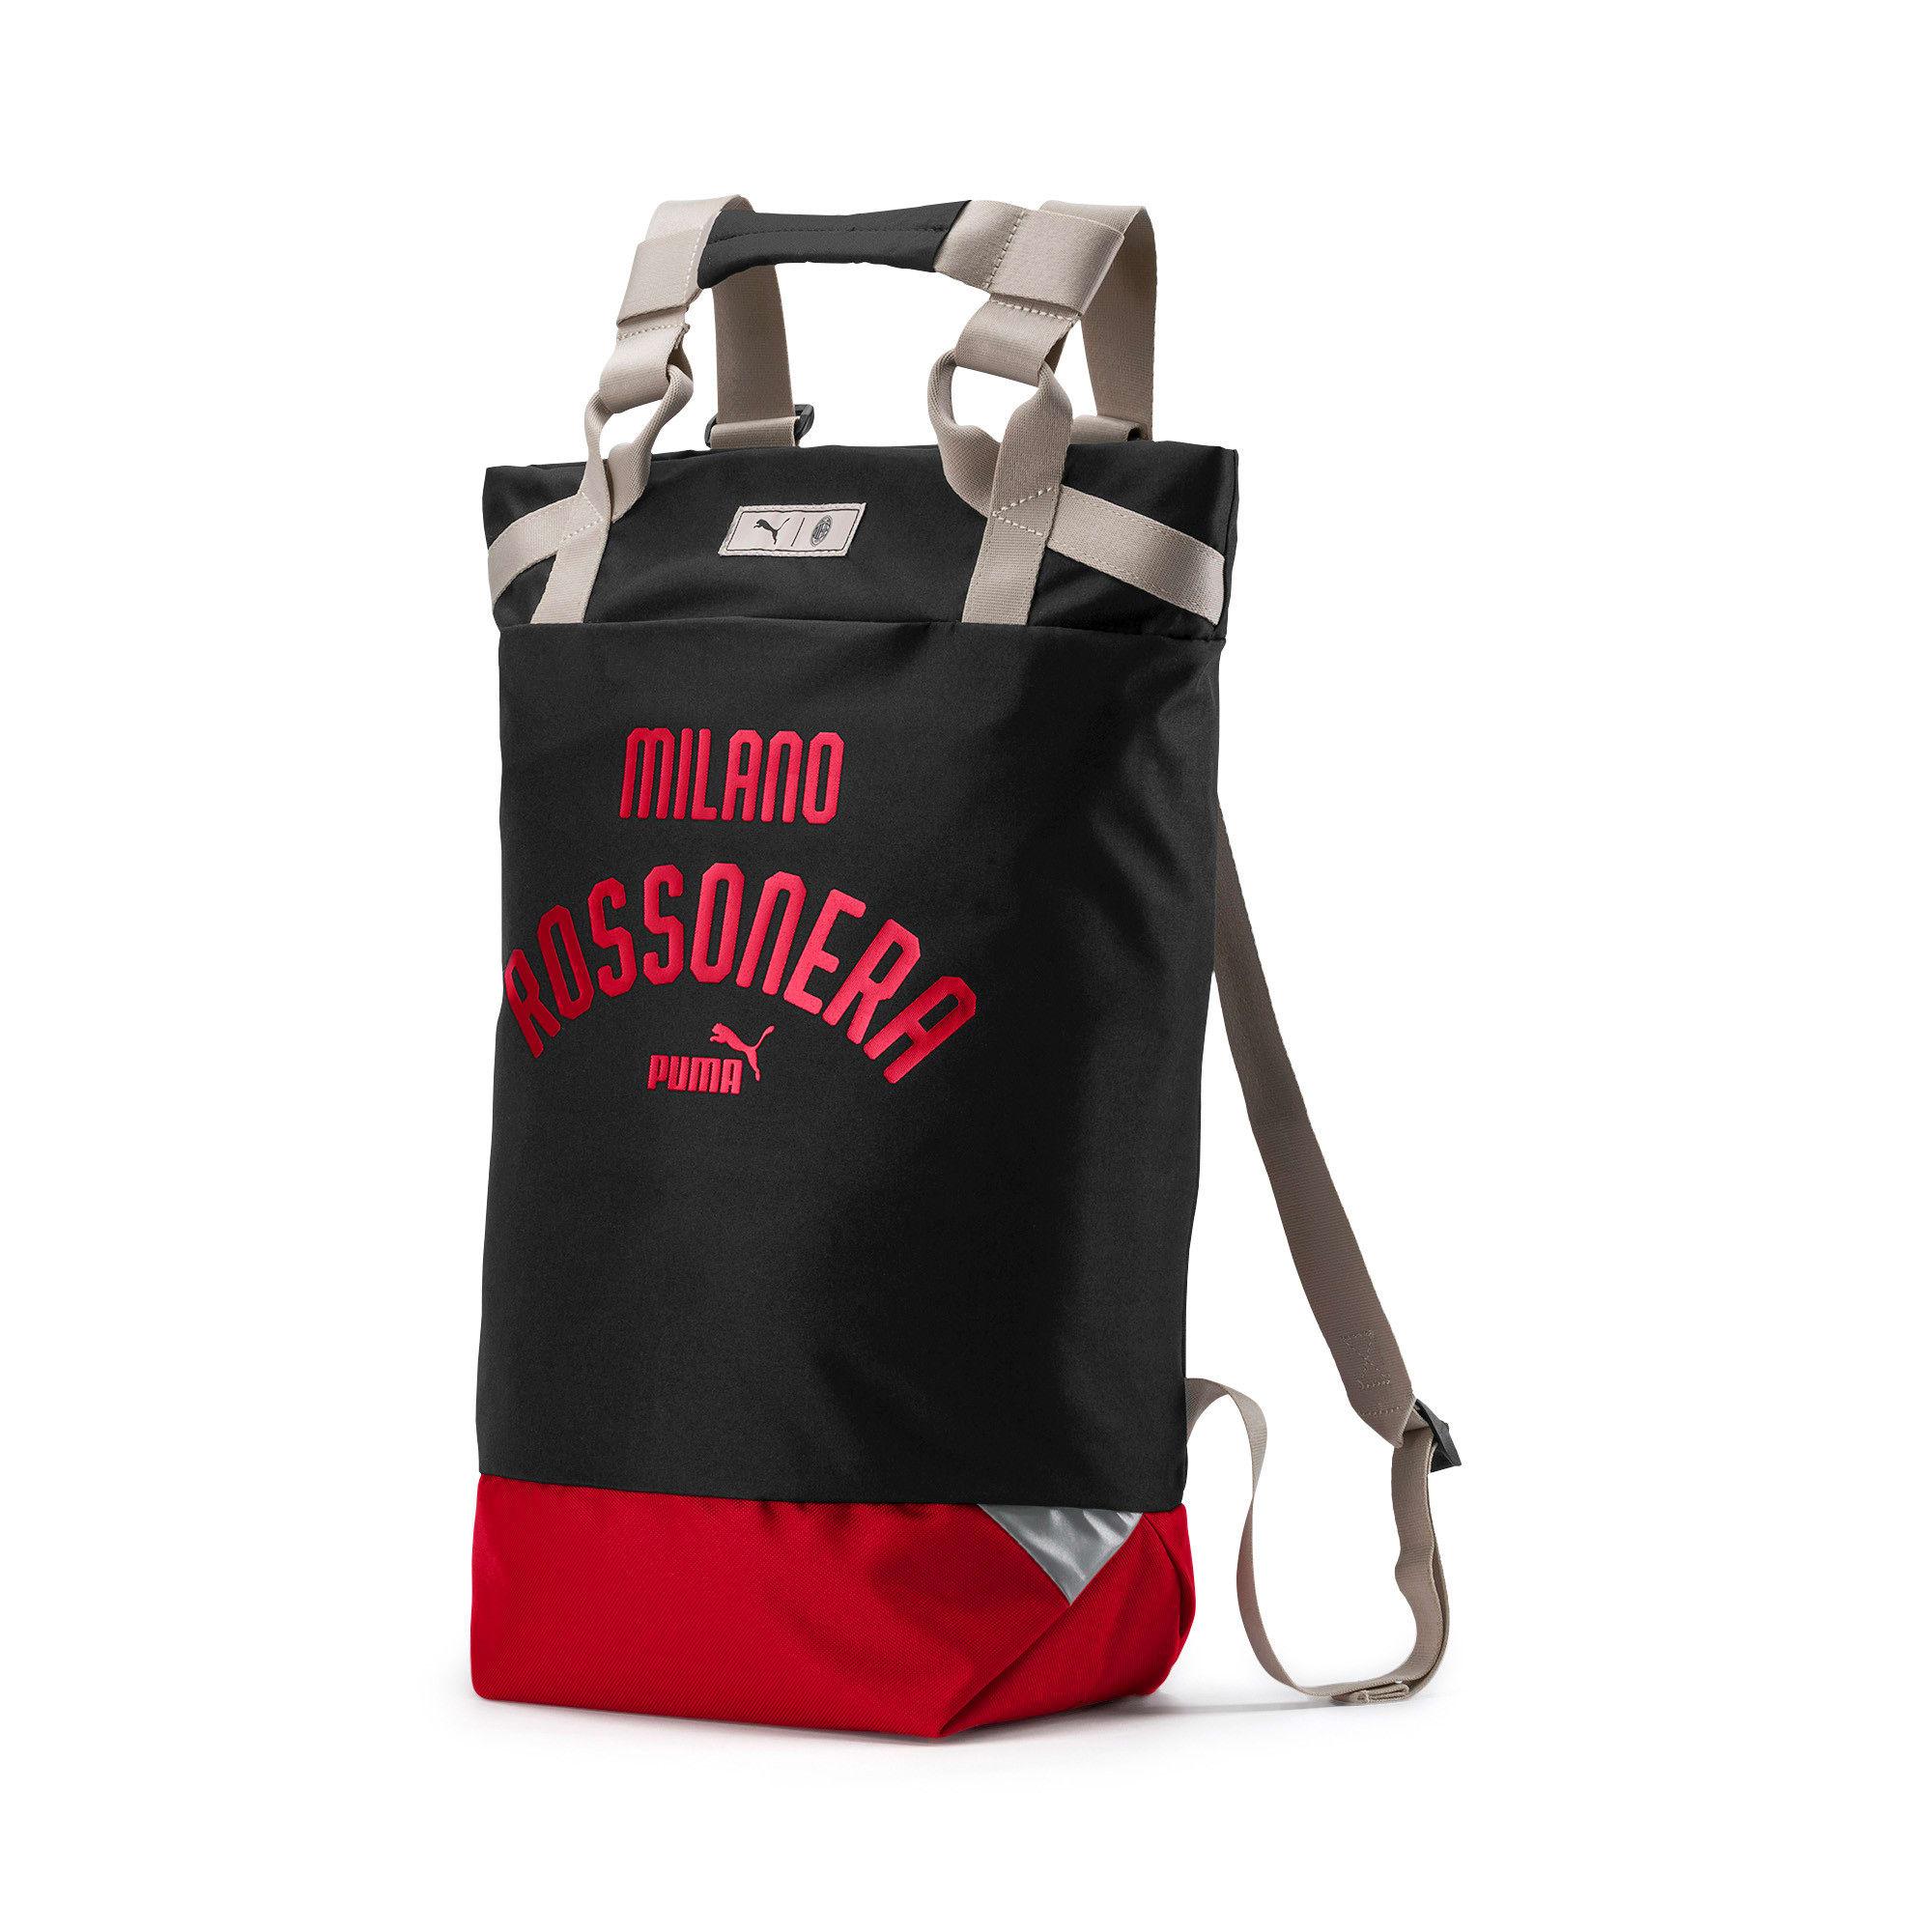 Thumbnail 1 of AC Milan Tote Backpack, Puma Black-Tango Red, medium-IND